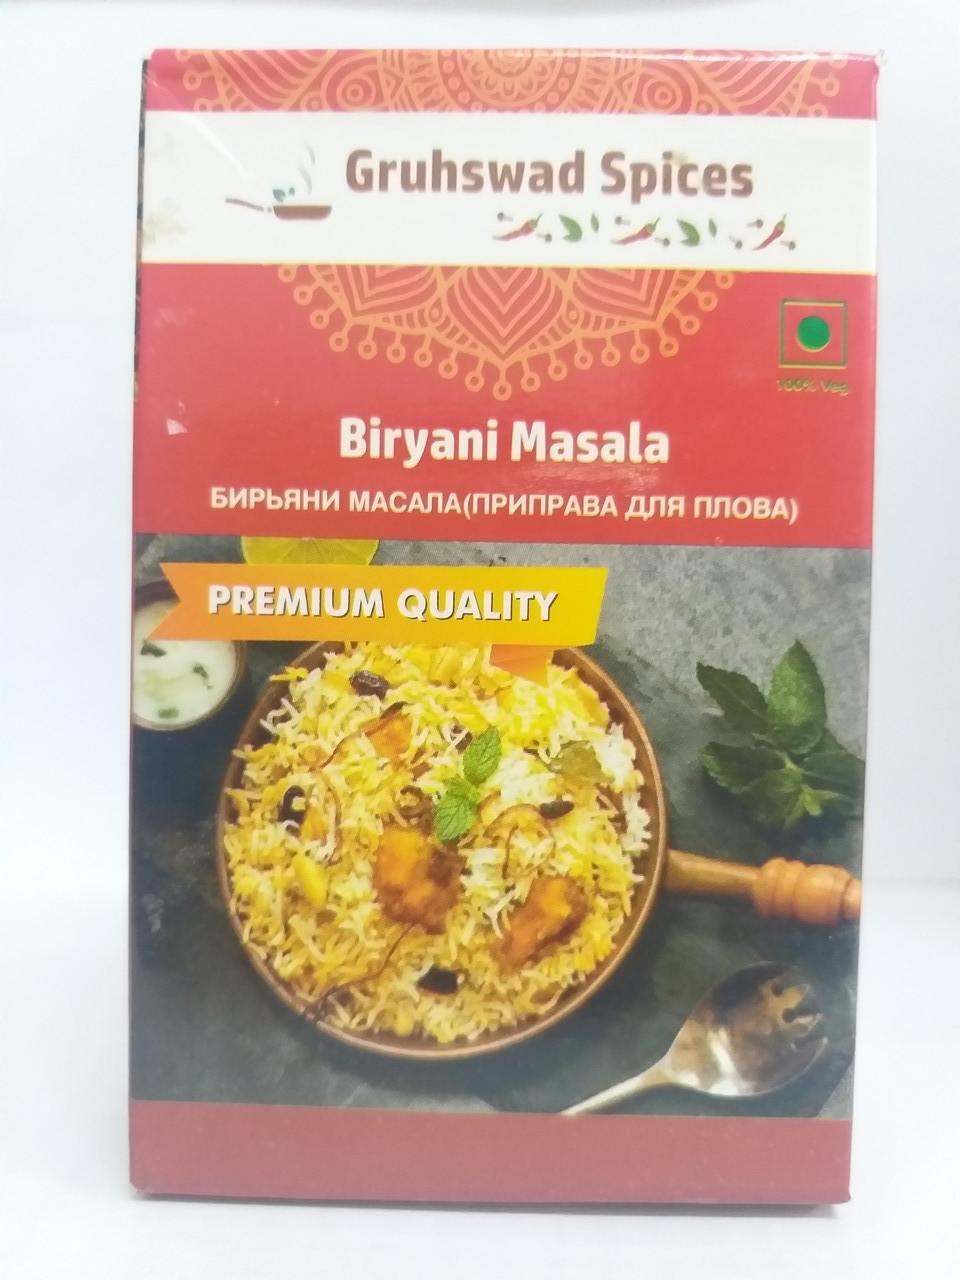 Бирьяни масала, приправа для плова, 50 гр, Biryani Masala, Gruhswad Spices